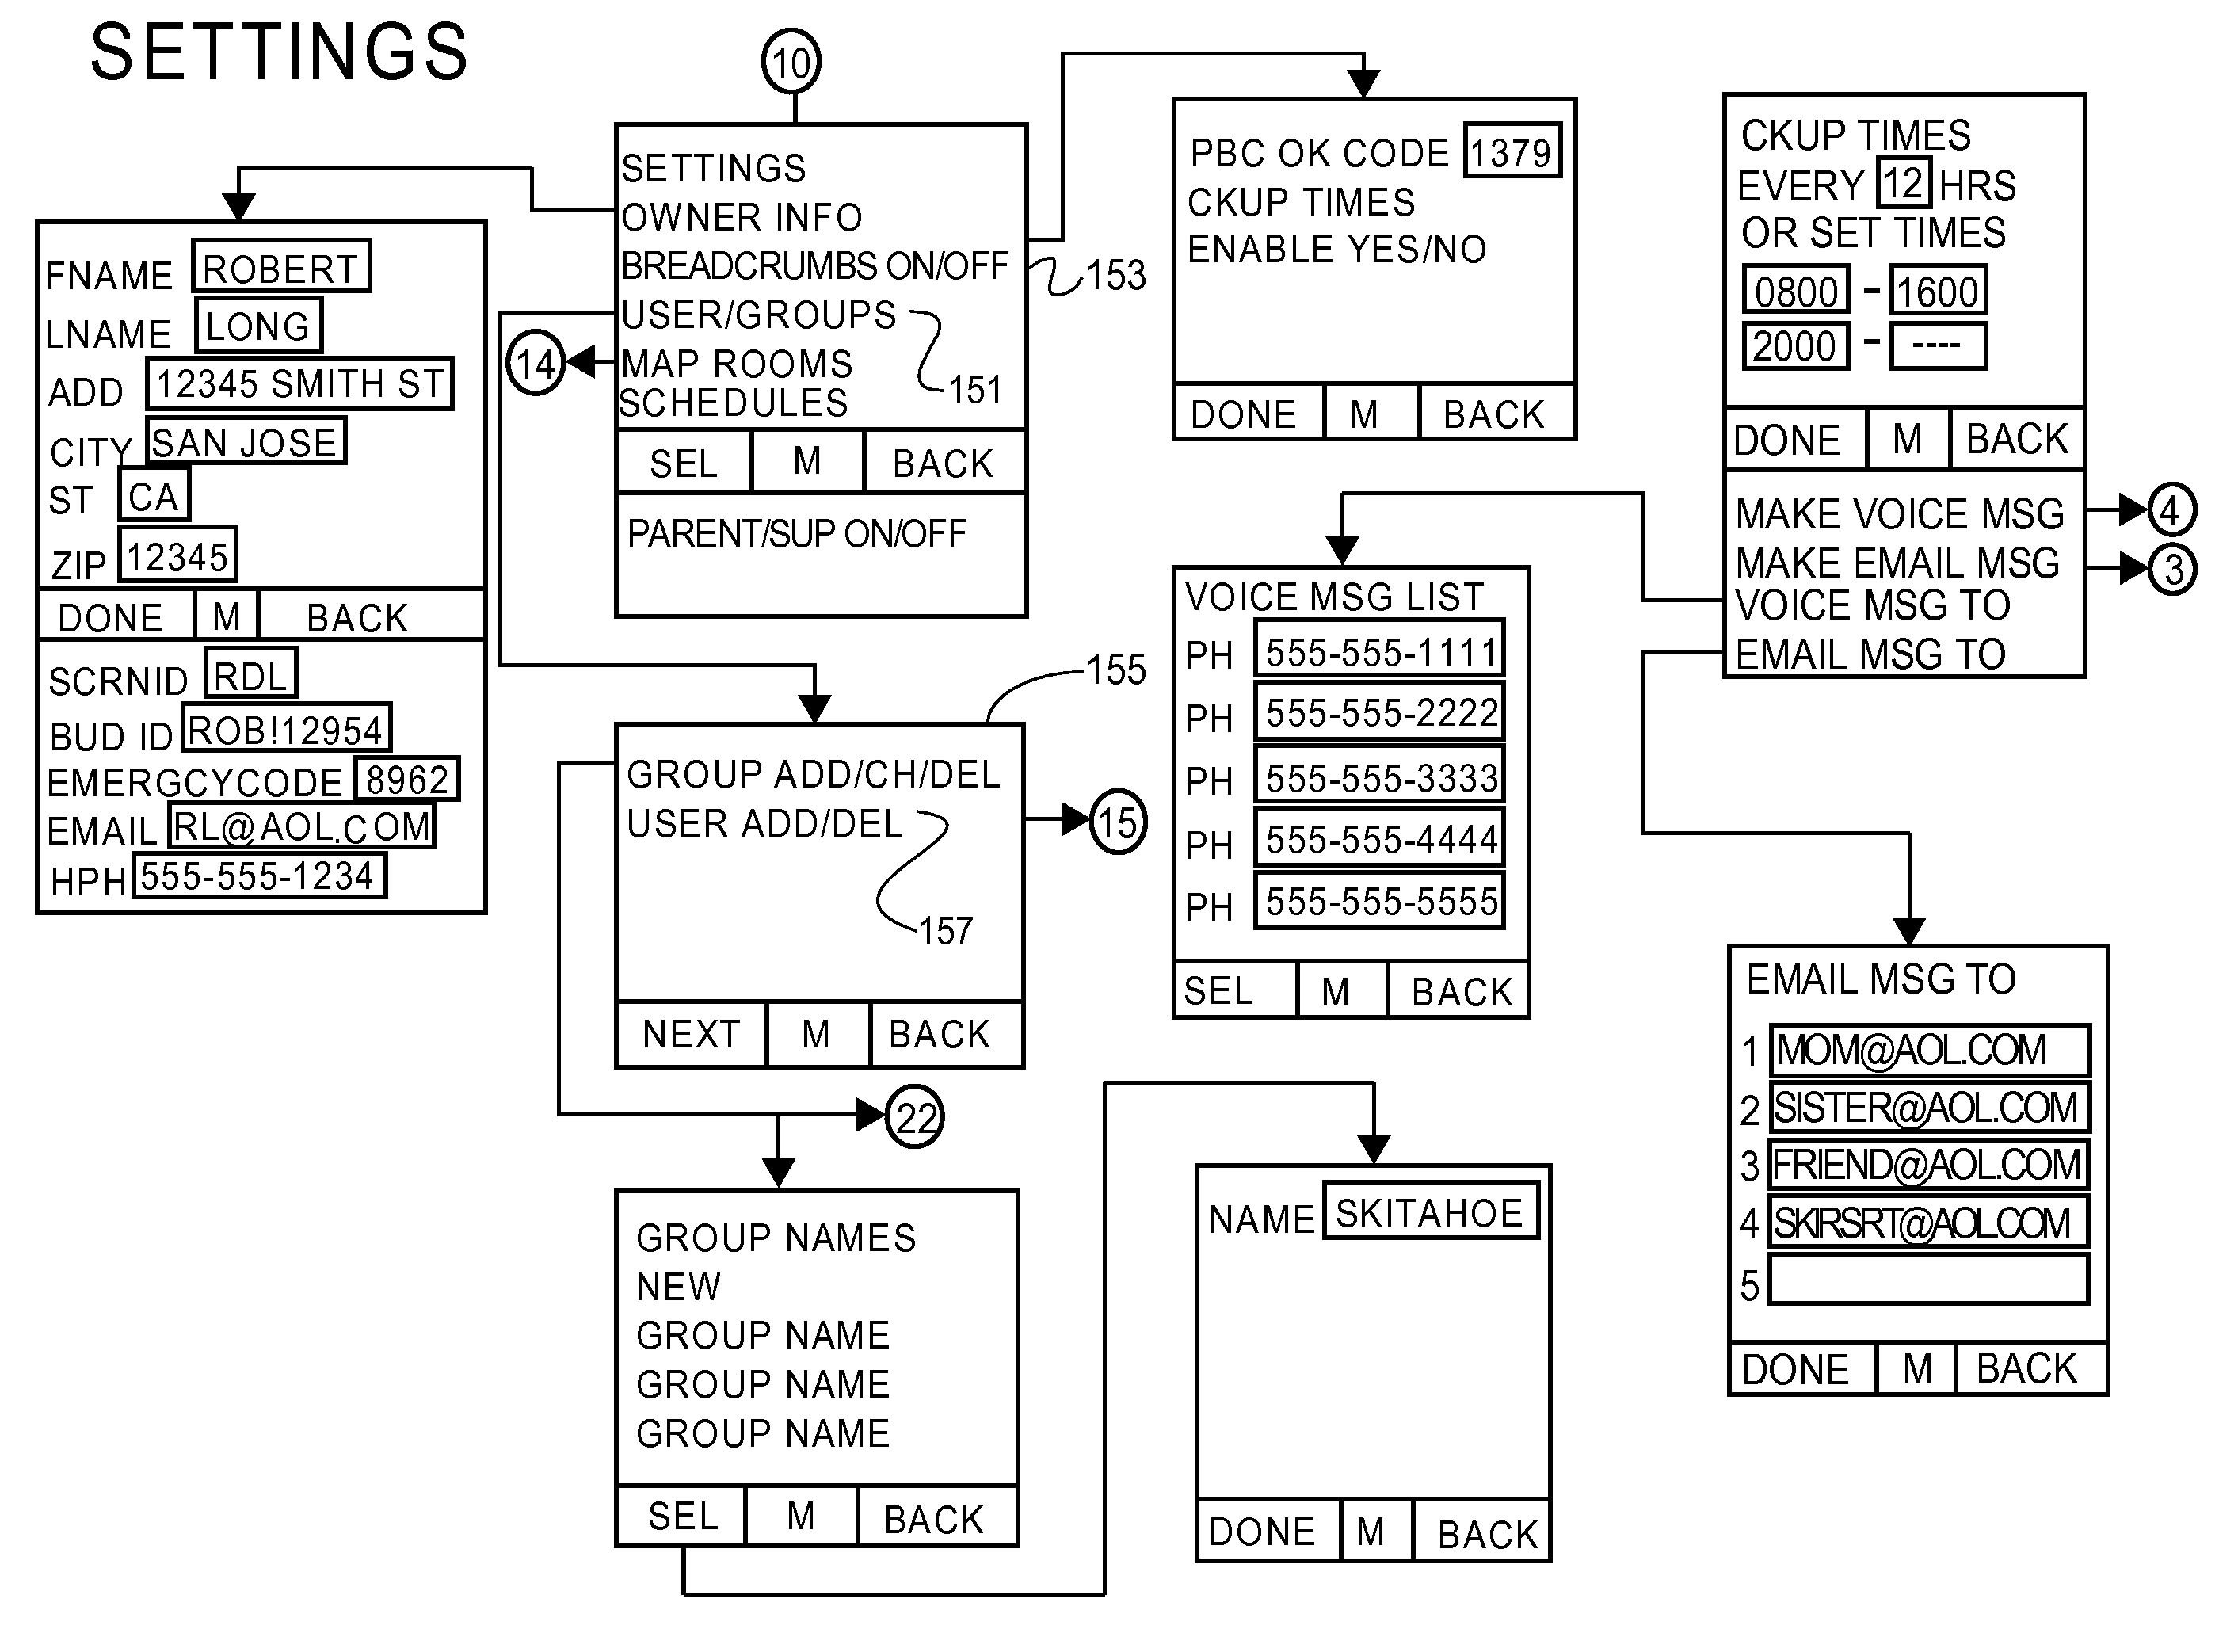 Patent Us 9167558 B2 Msg 3 Logic Diagram First Claim